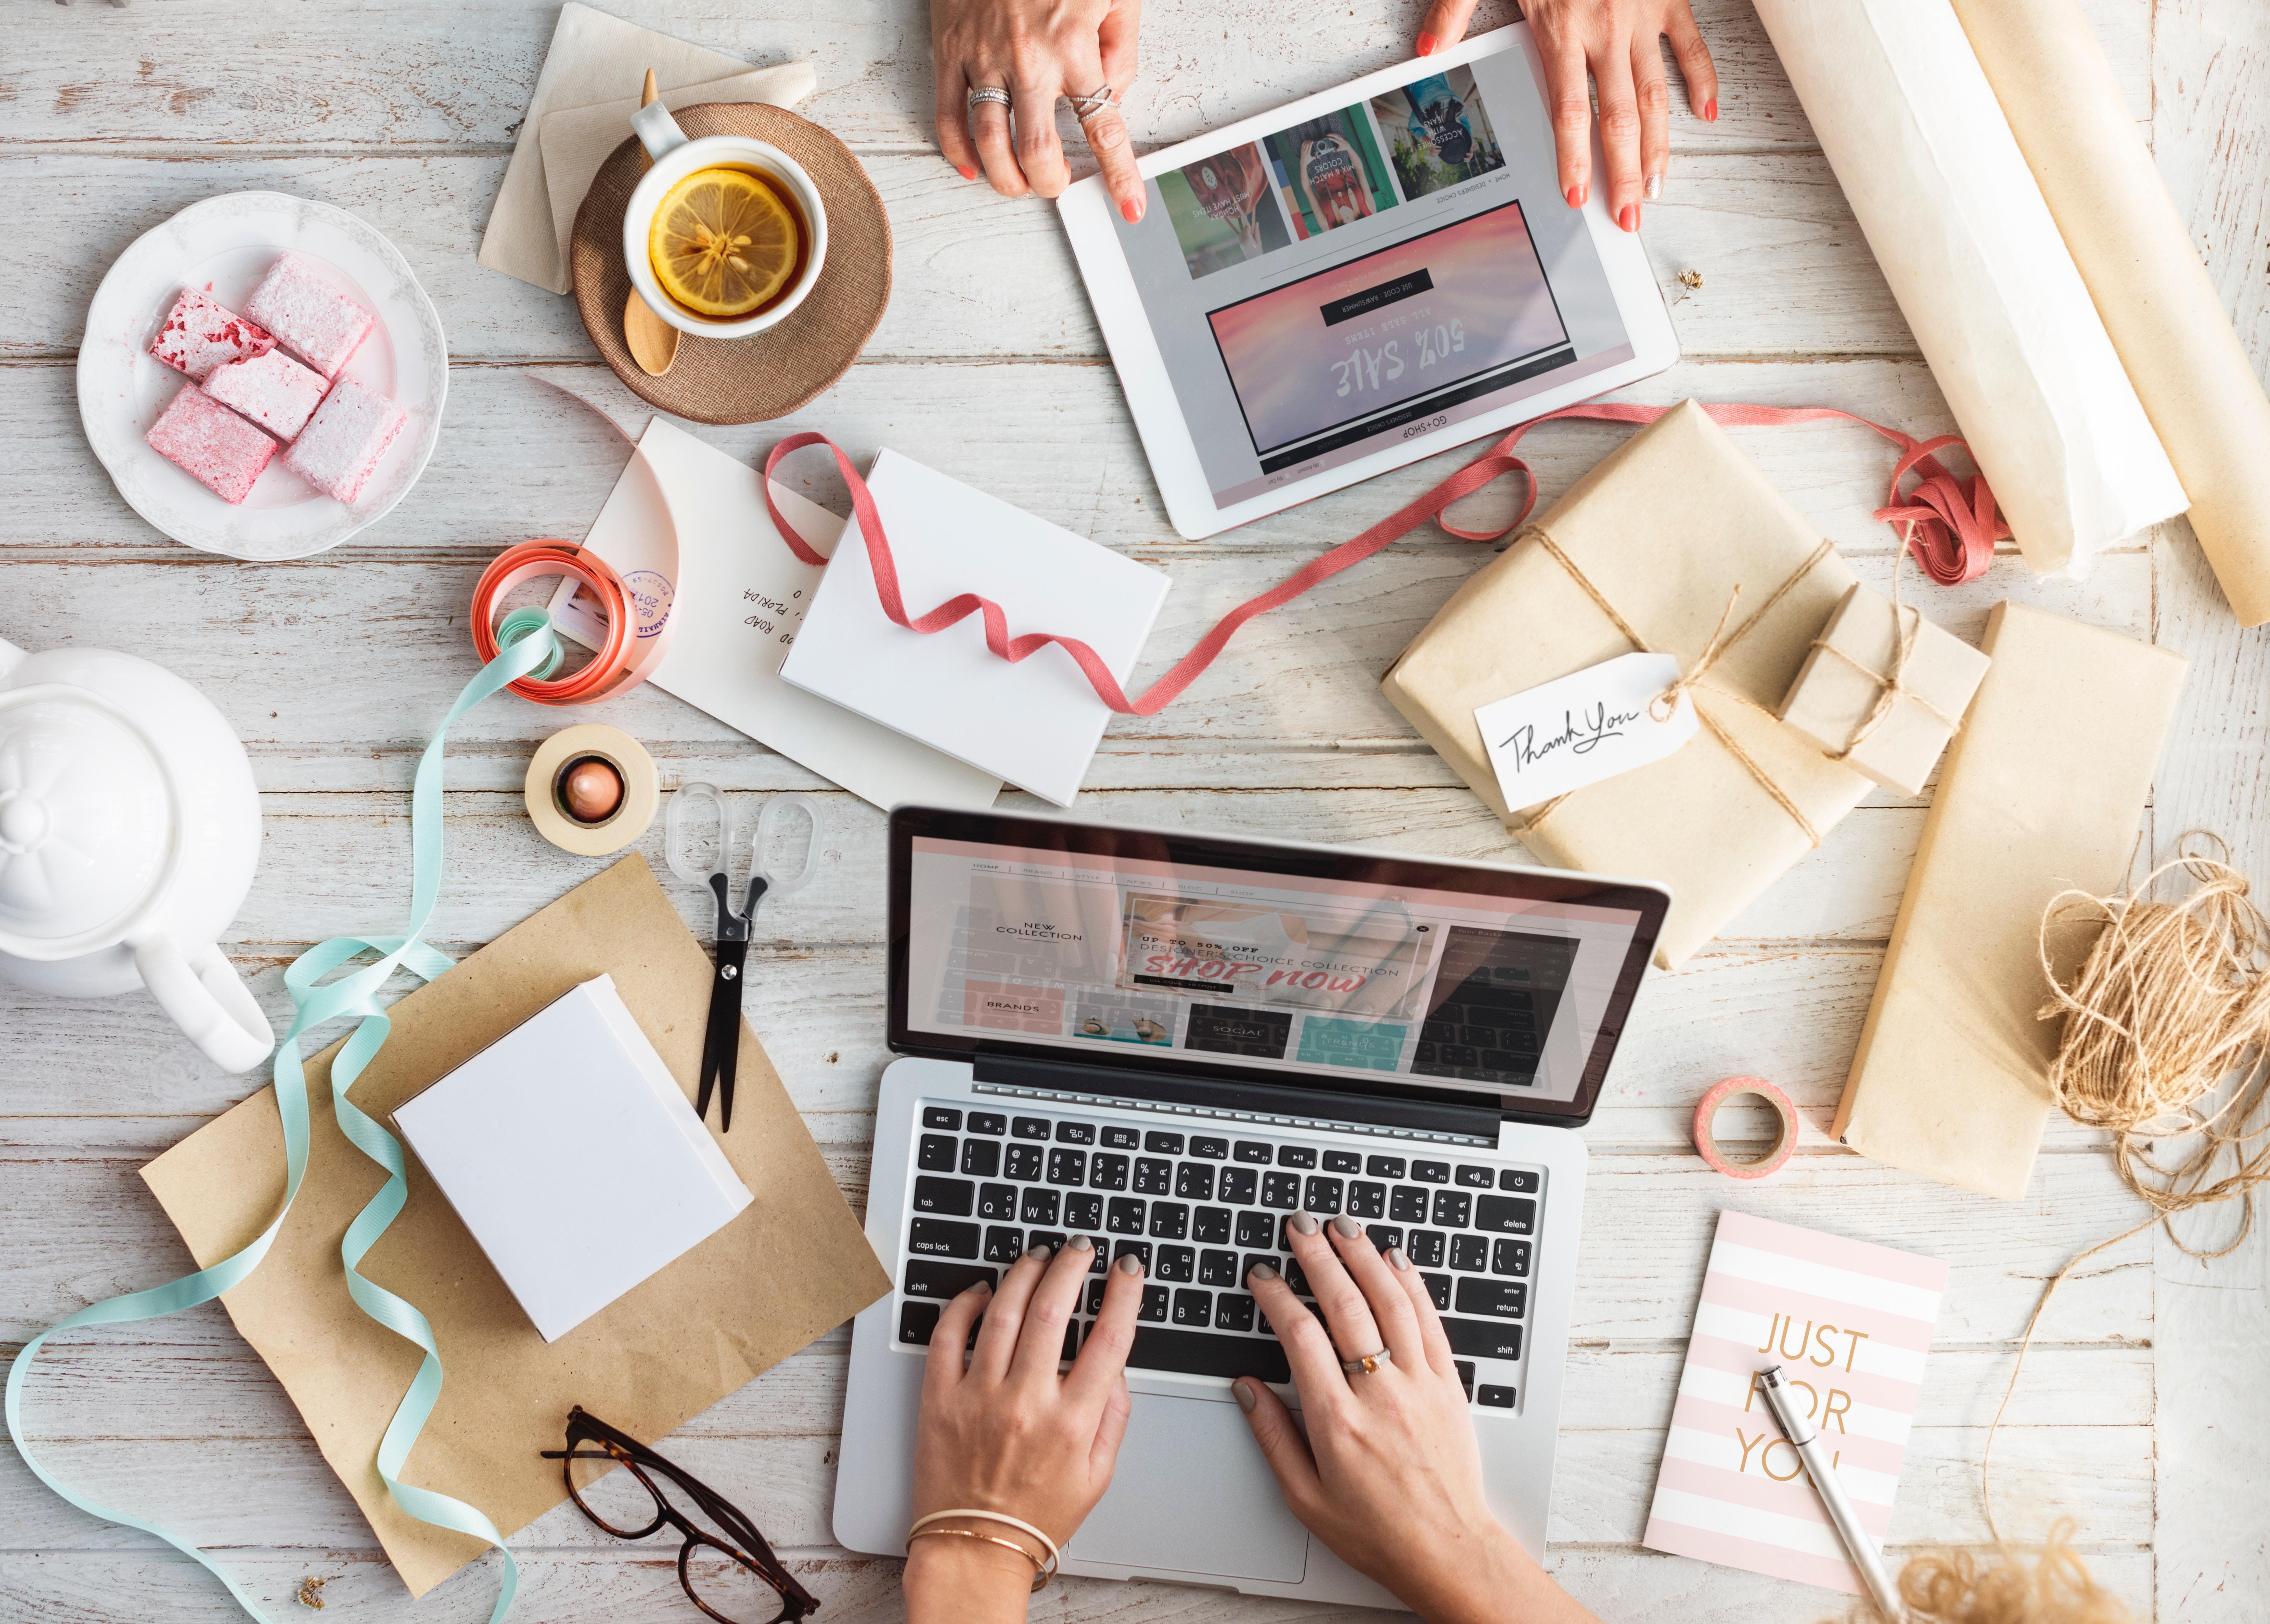 Increasing Employee Capacity via Technology